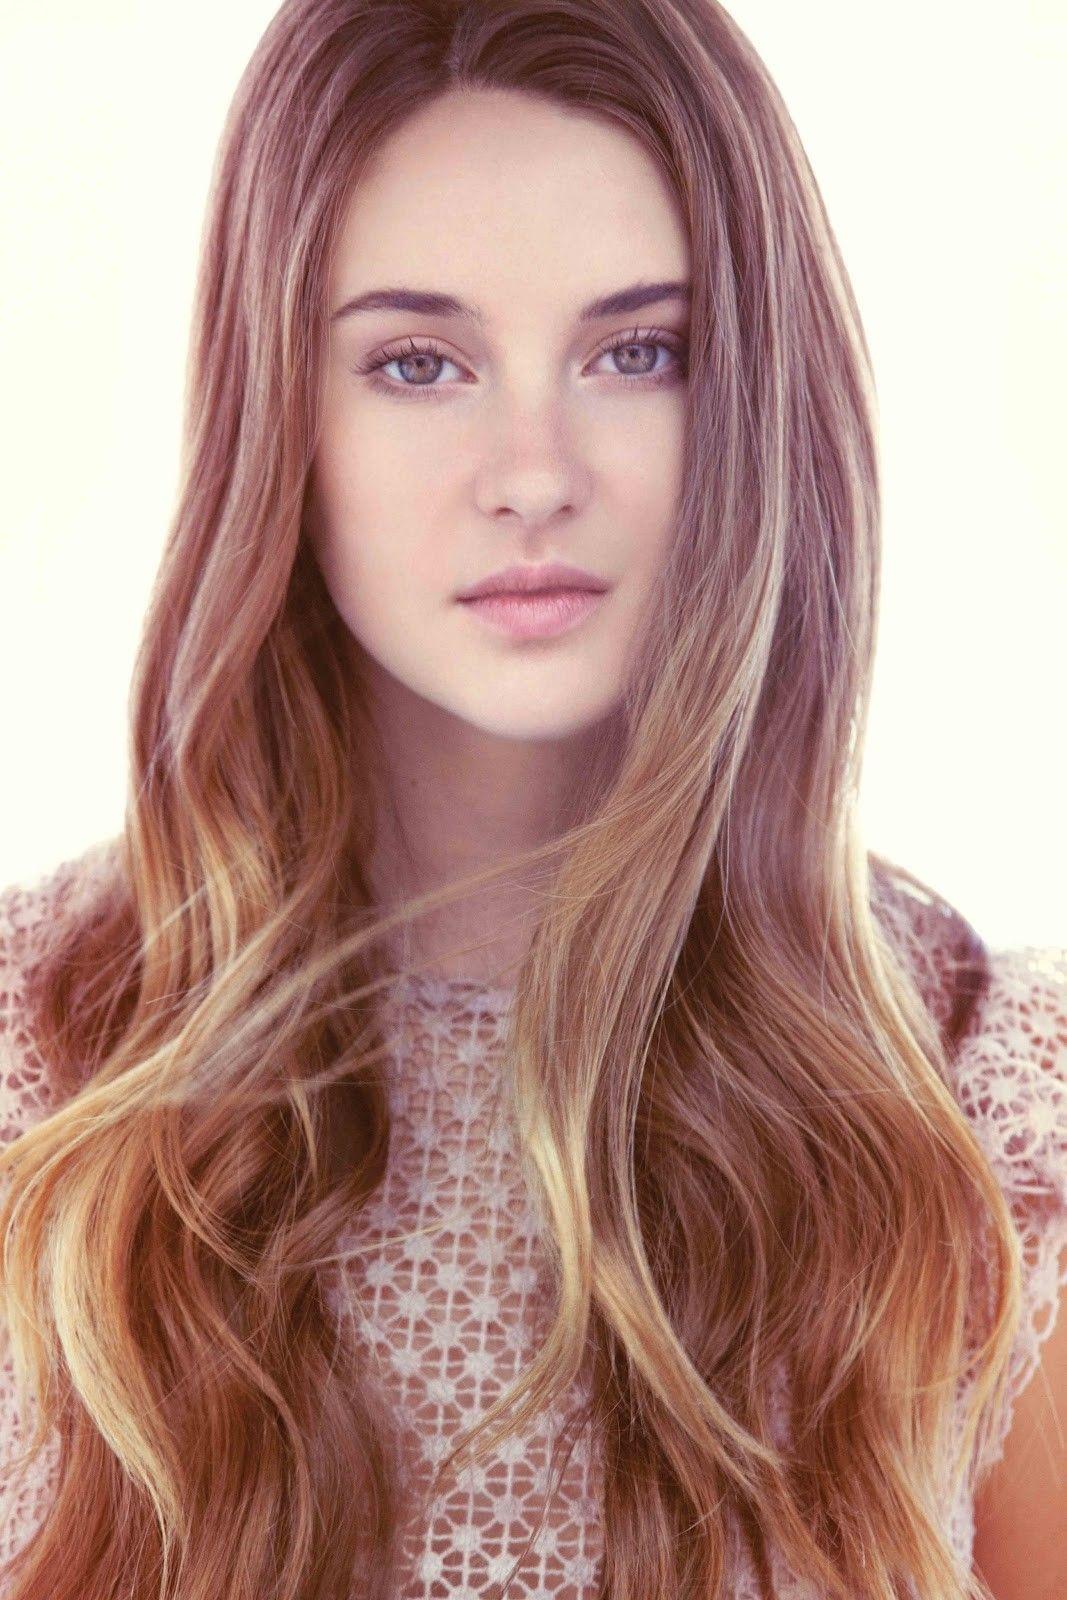 Shailene Woodley Beautiful Hd Wallpaper Latest Long Thin Hair Hairstyles For Thin Hair Long Hair Styles